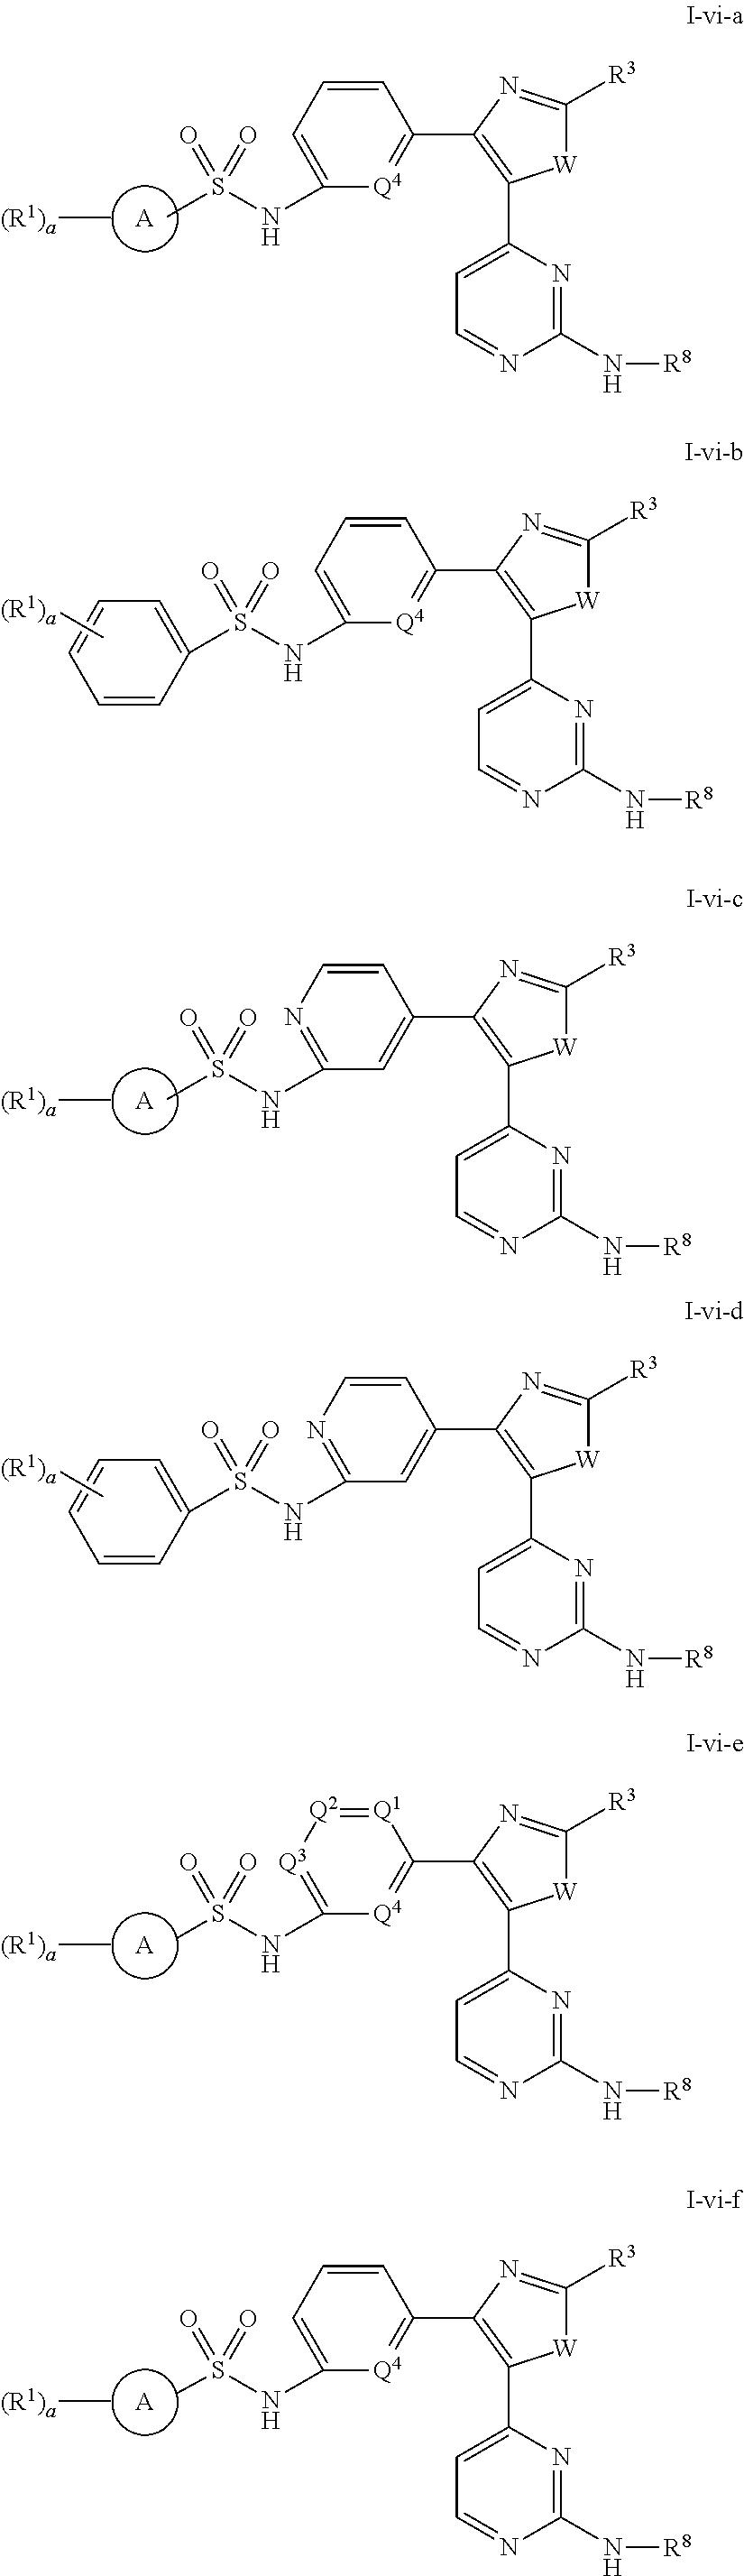 Us8642759b2 Benzene Sulfonamide Thiazole And Oxazole Compounds Bolens G174 Wiring Diagram Figure Us08642759 20140204 C00048